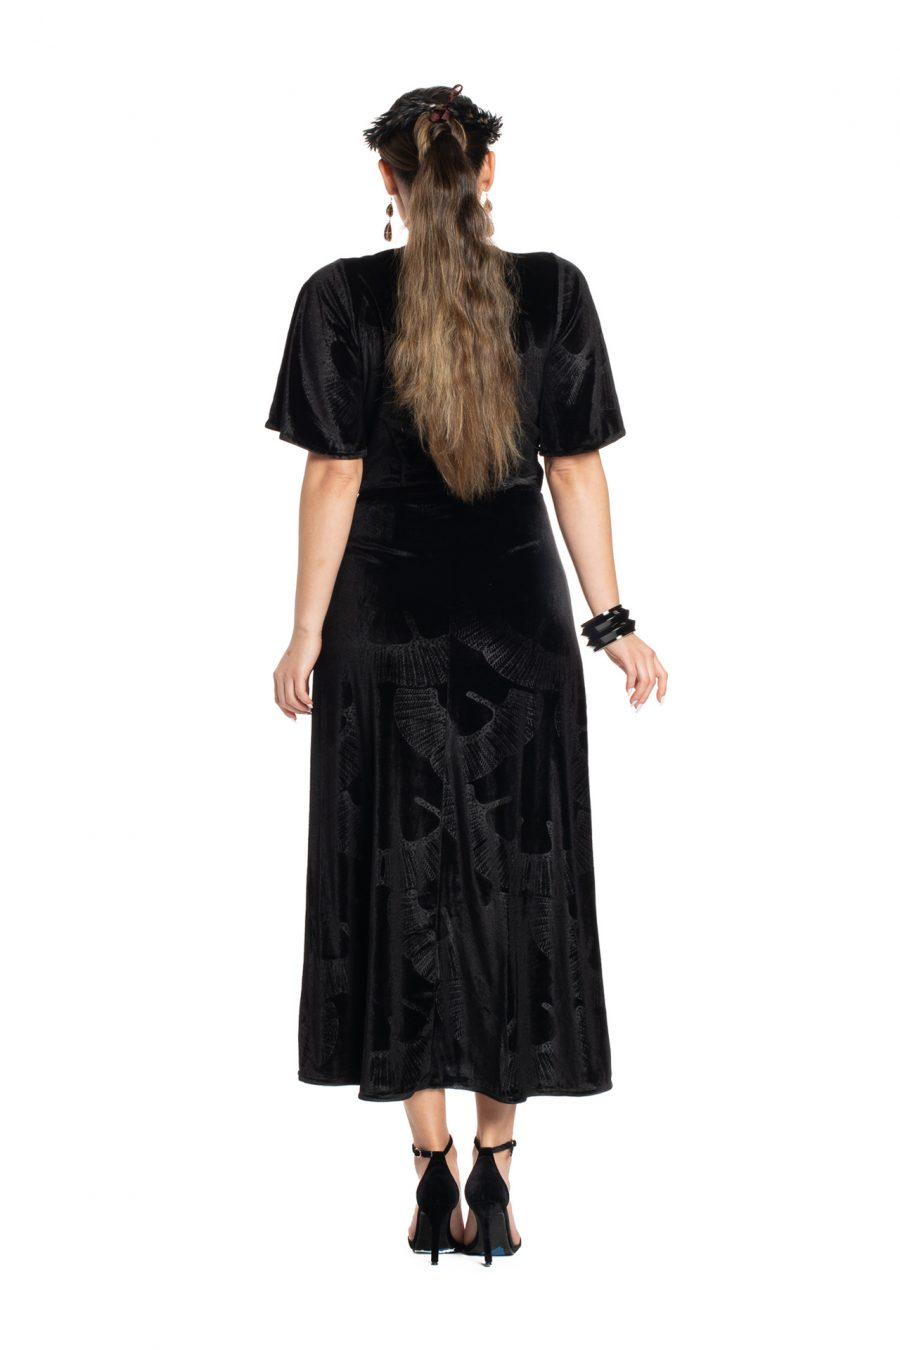 Model wearing Peahi Wrap Dress in Black - Back View